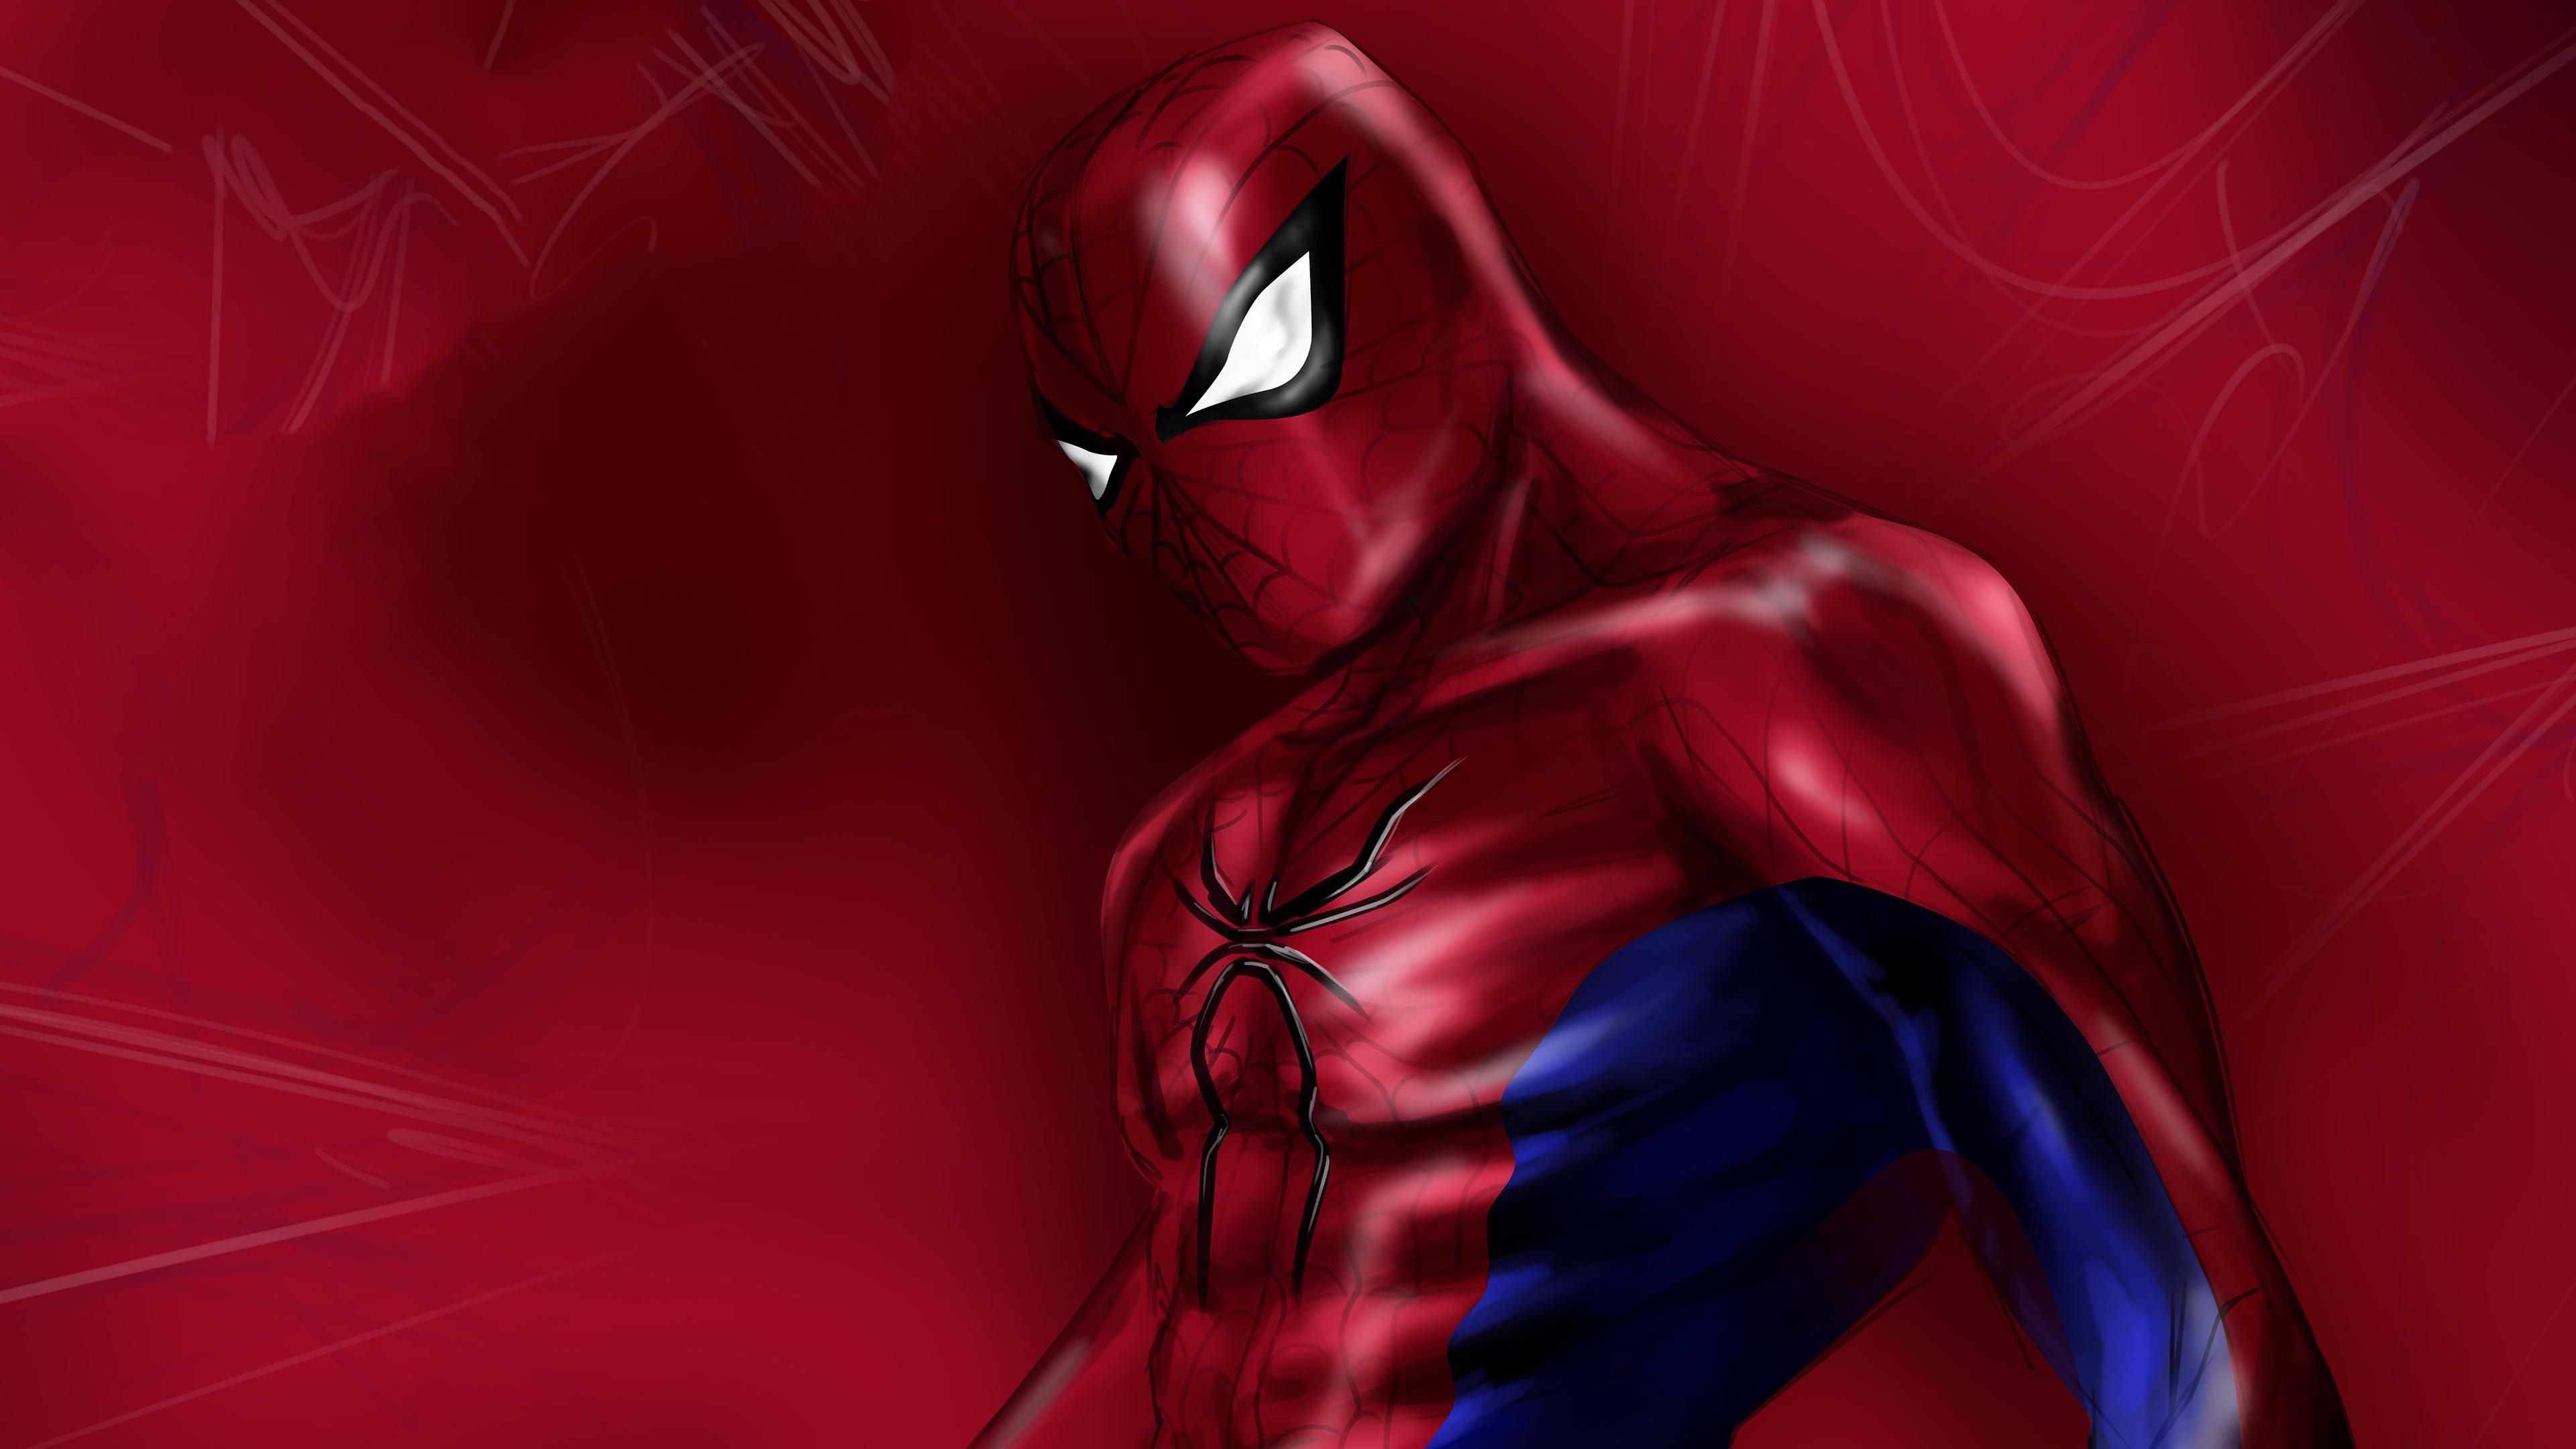 spiderman comic art 4k 1546276364 - Spiderman Comic Art 4k - superheroes wallpapers, spiderman wallpapers, hd-wallpapers, digital art wallpapers, behance wallpapers, artwork wallpapers, artist wallpapers, 4k-wallpapers